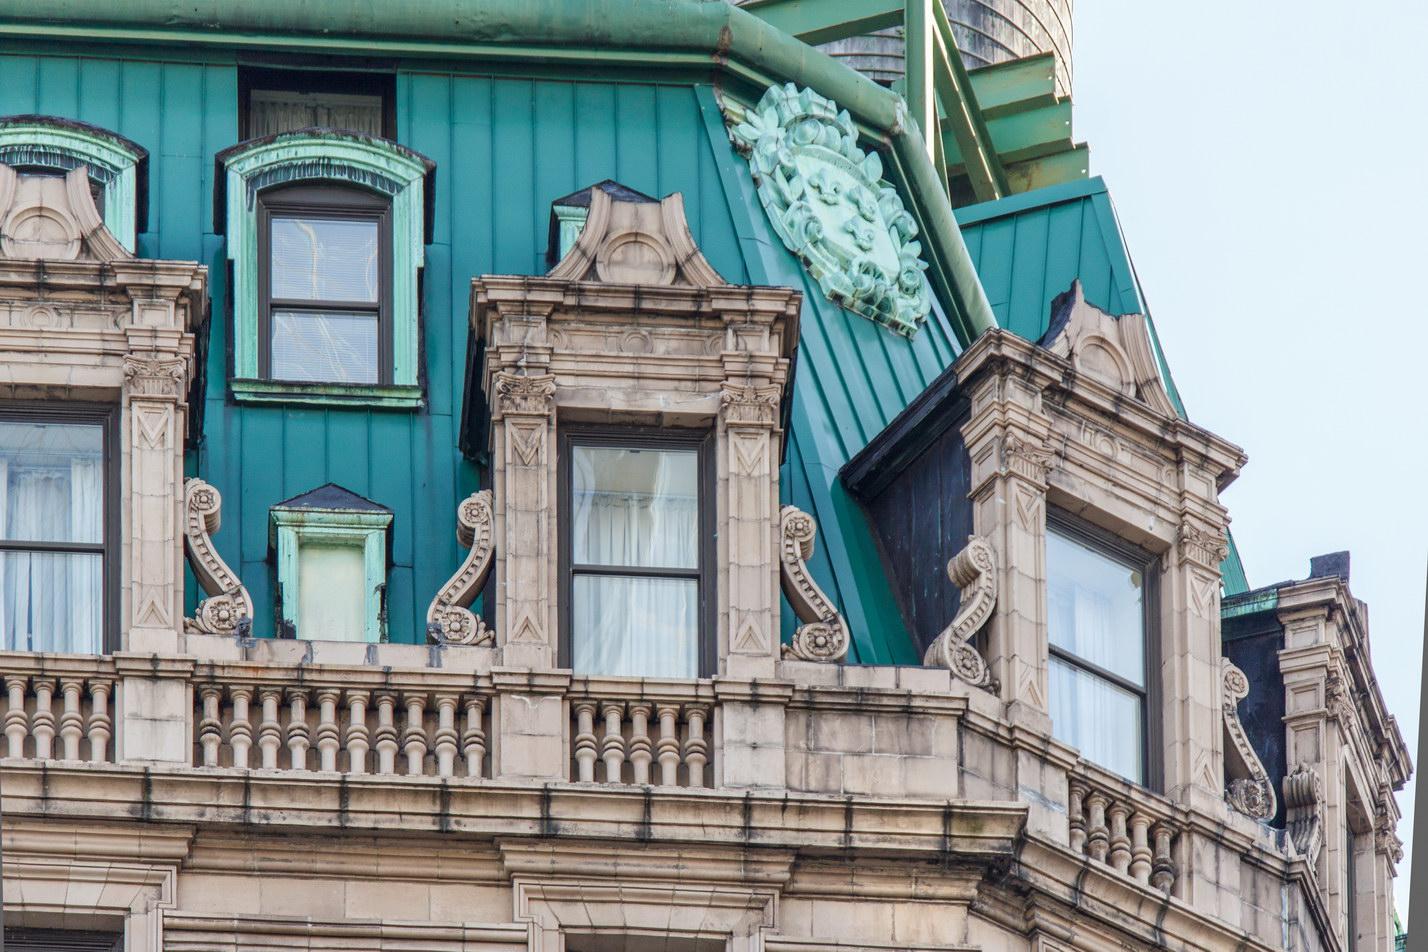 Detail, Broadway facade.